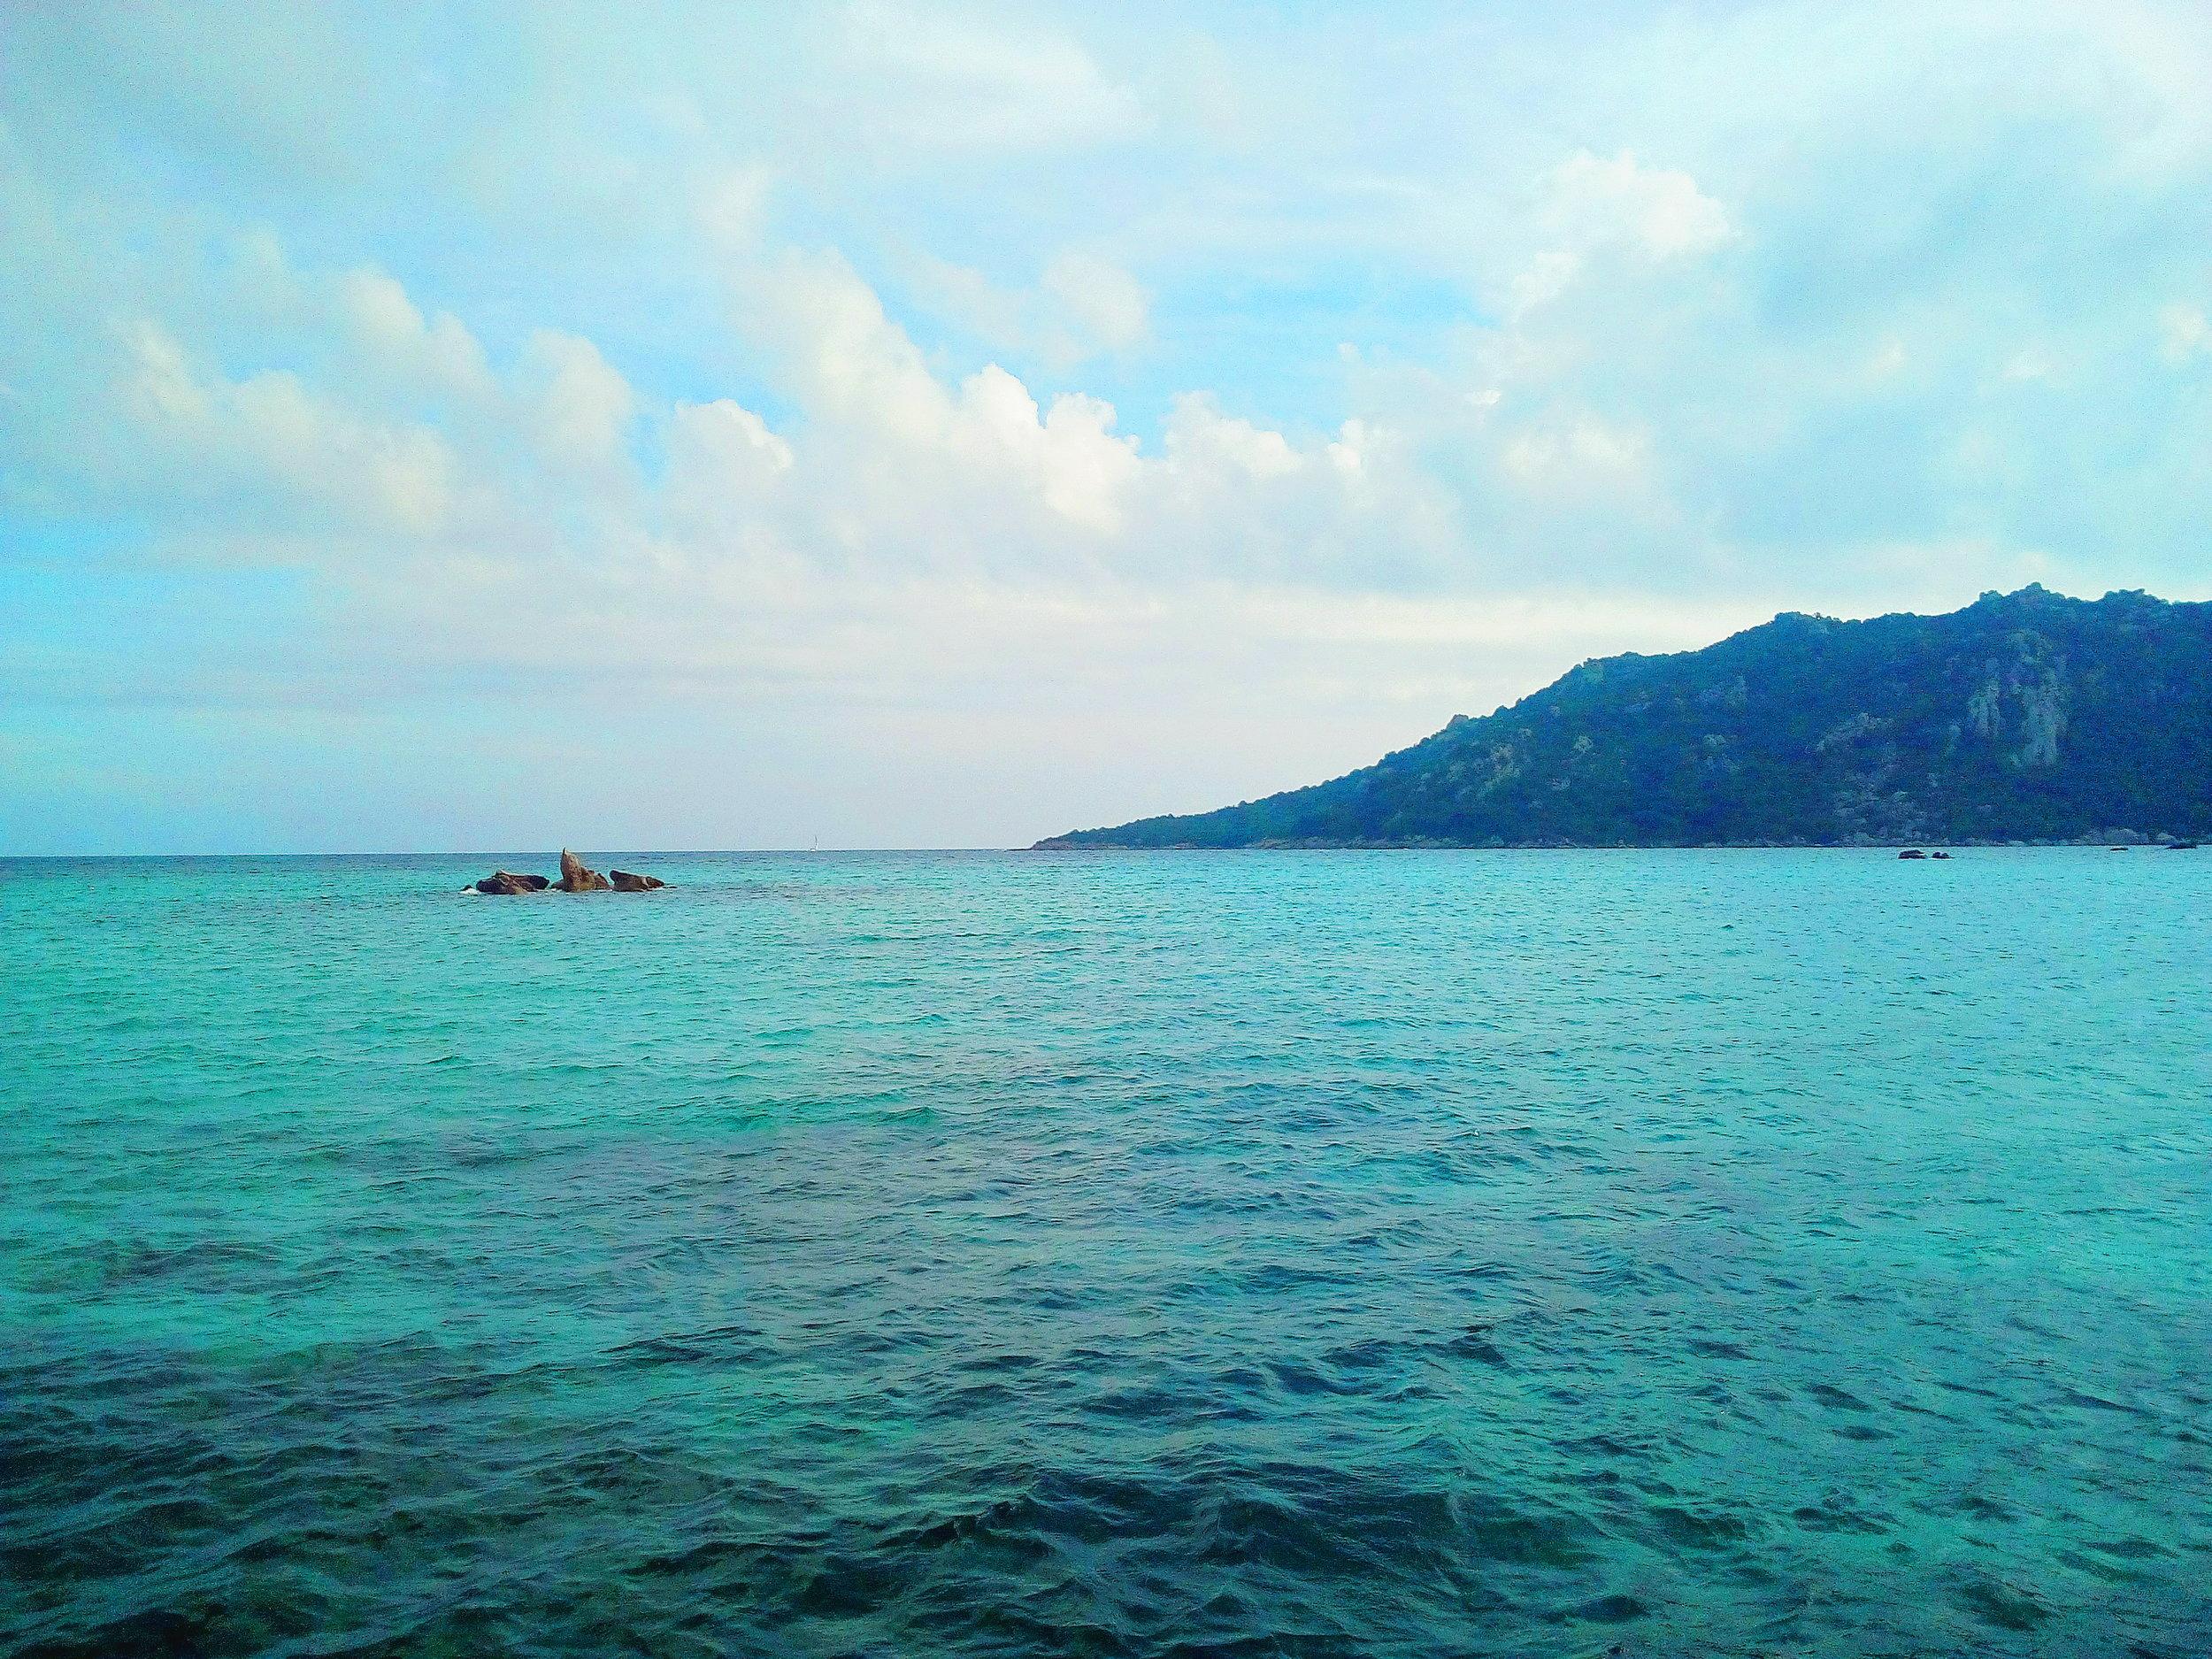 Santa Giulia Beach in Corsica